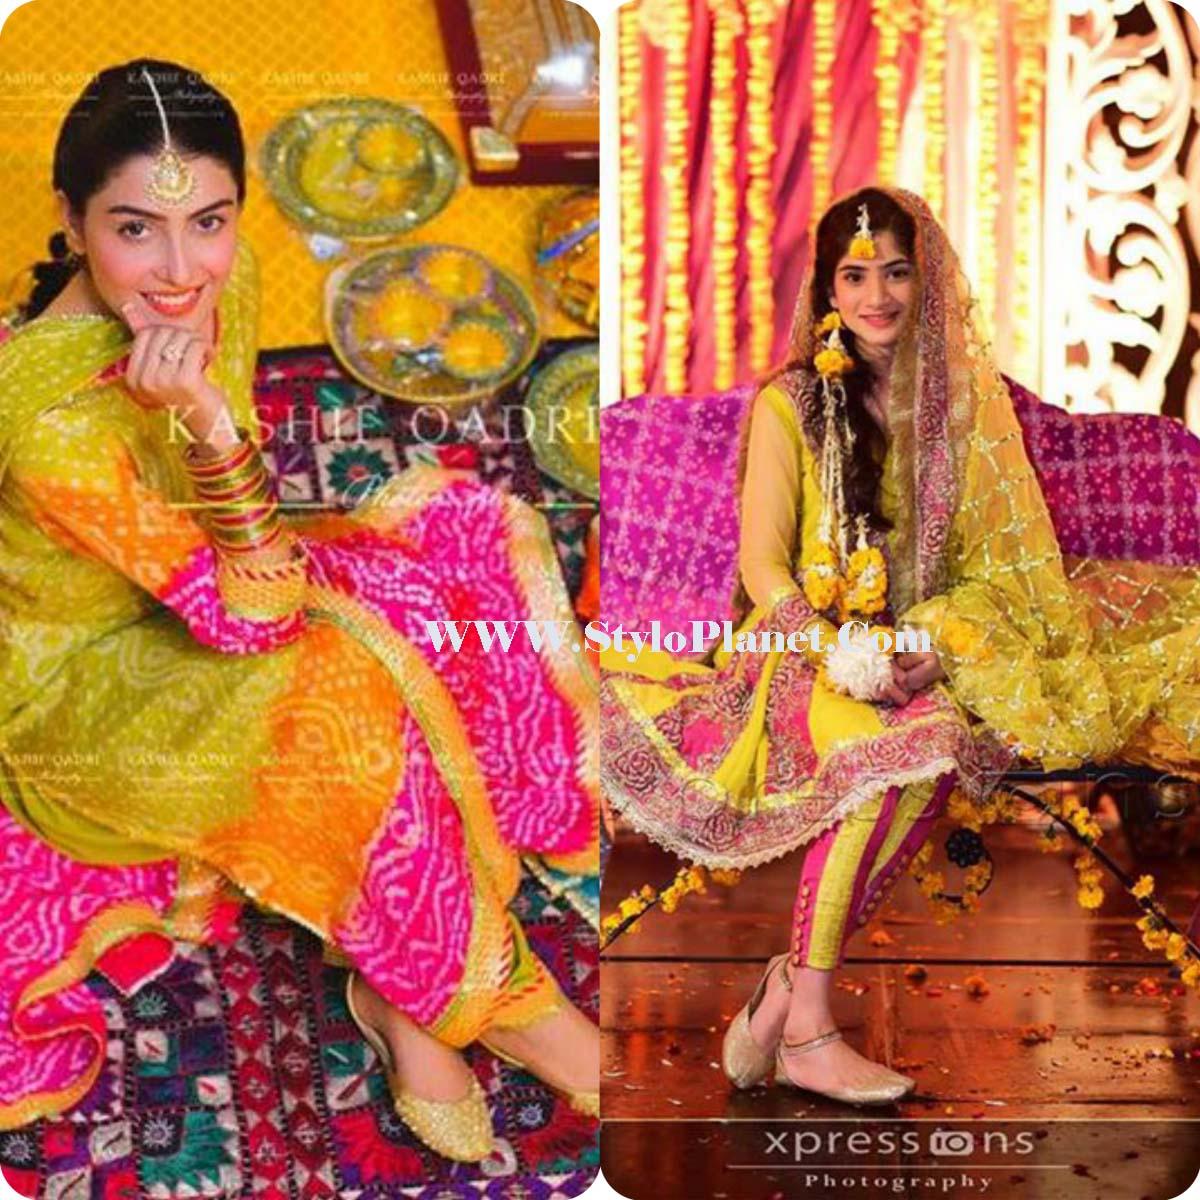 Mehndi Clothes Design 2018 : Mayoun mehndi latest dresses for bridals stylo planet